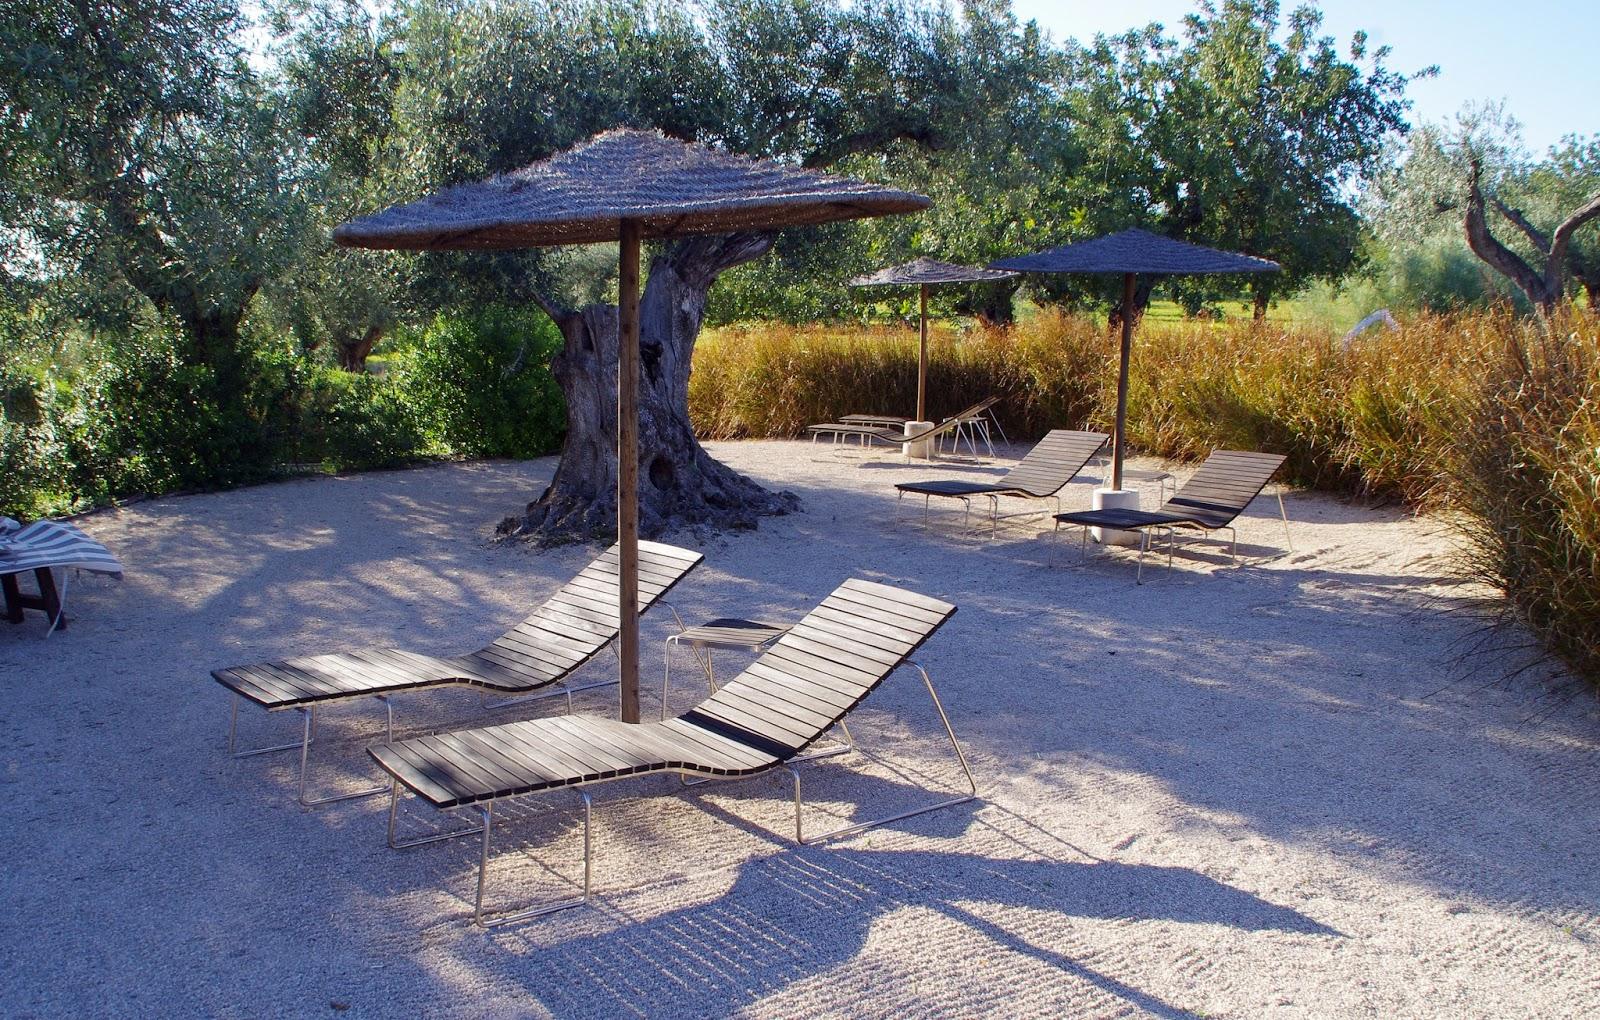 Fazenda Nova Country House Outdoor Loungers